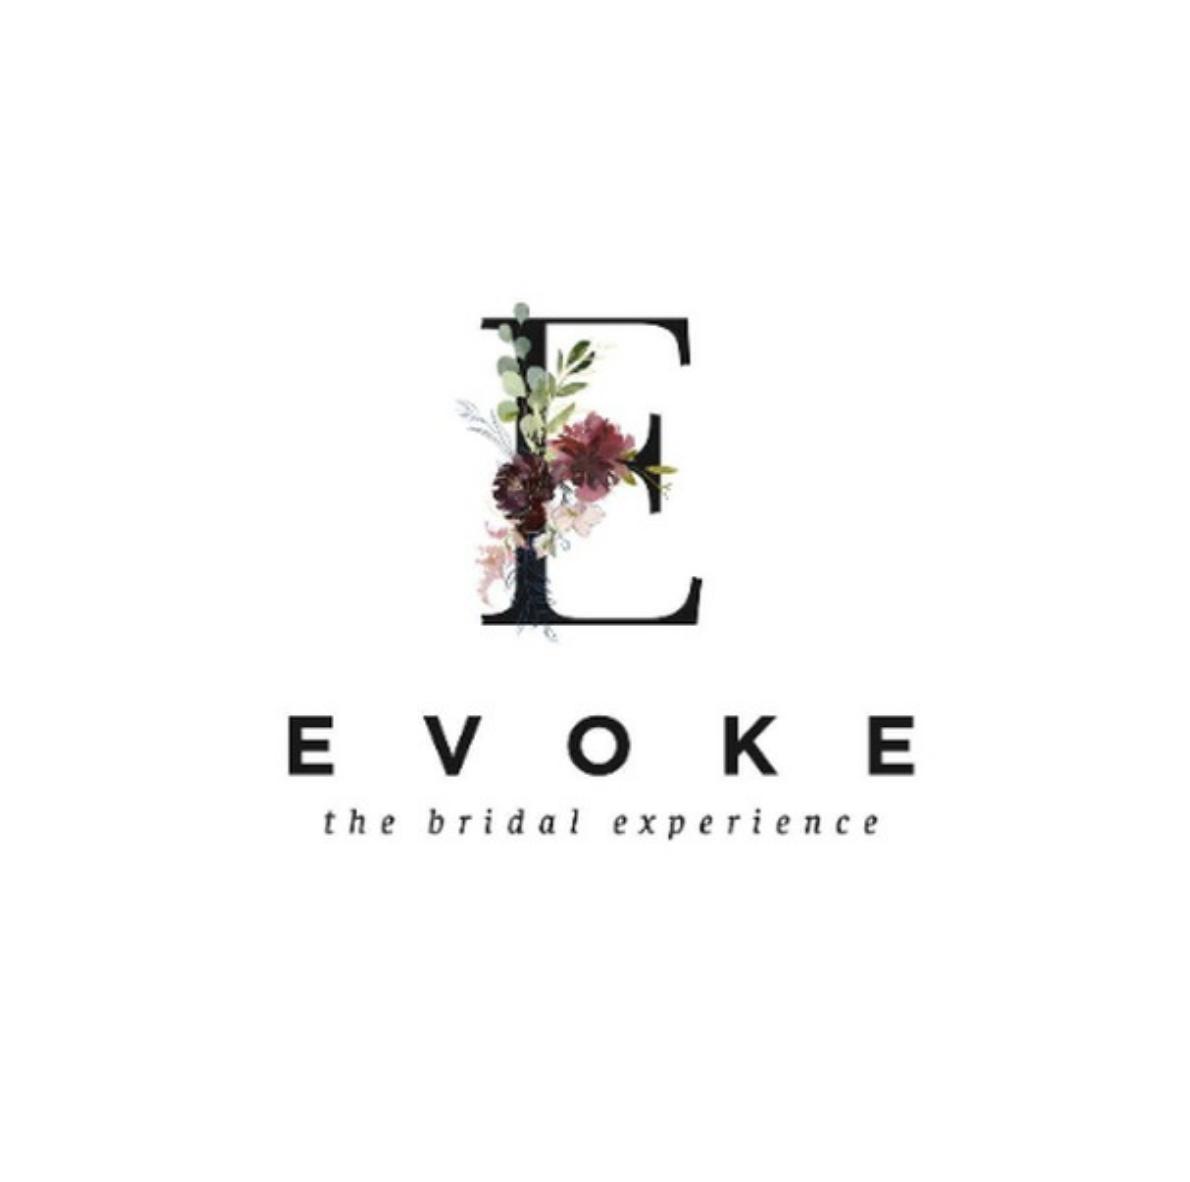 EVOKE: the bridal experience - Houston Attire